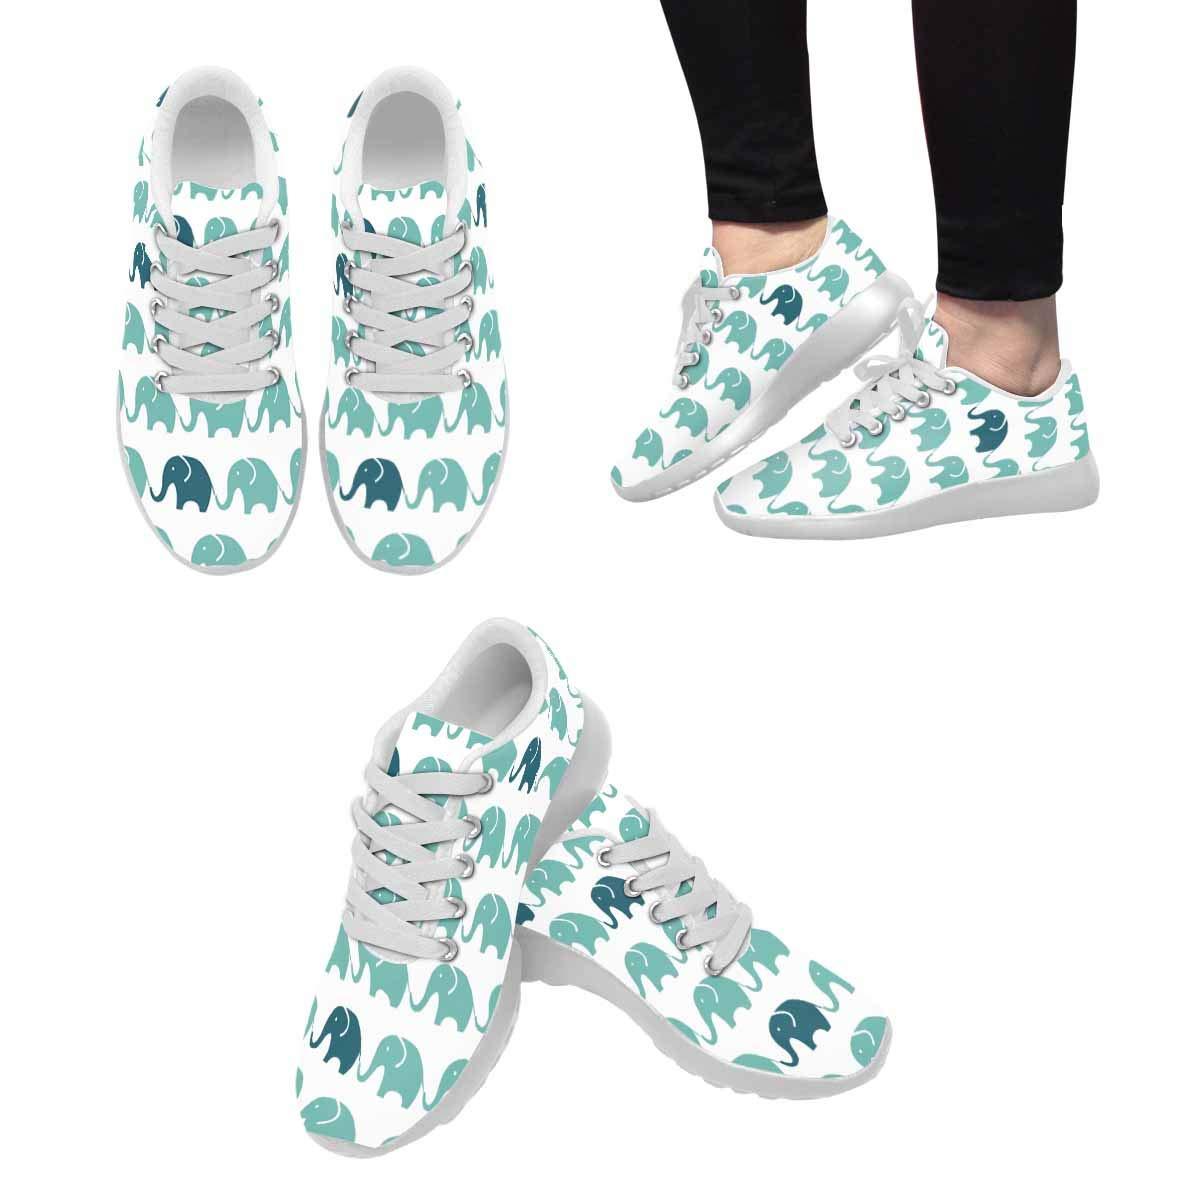 INTERESTPRINT Womens Jogging Sneakers Outdoor Sport Cross Training Shoes Flamingo Bird Pattern